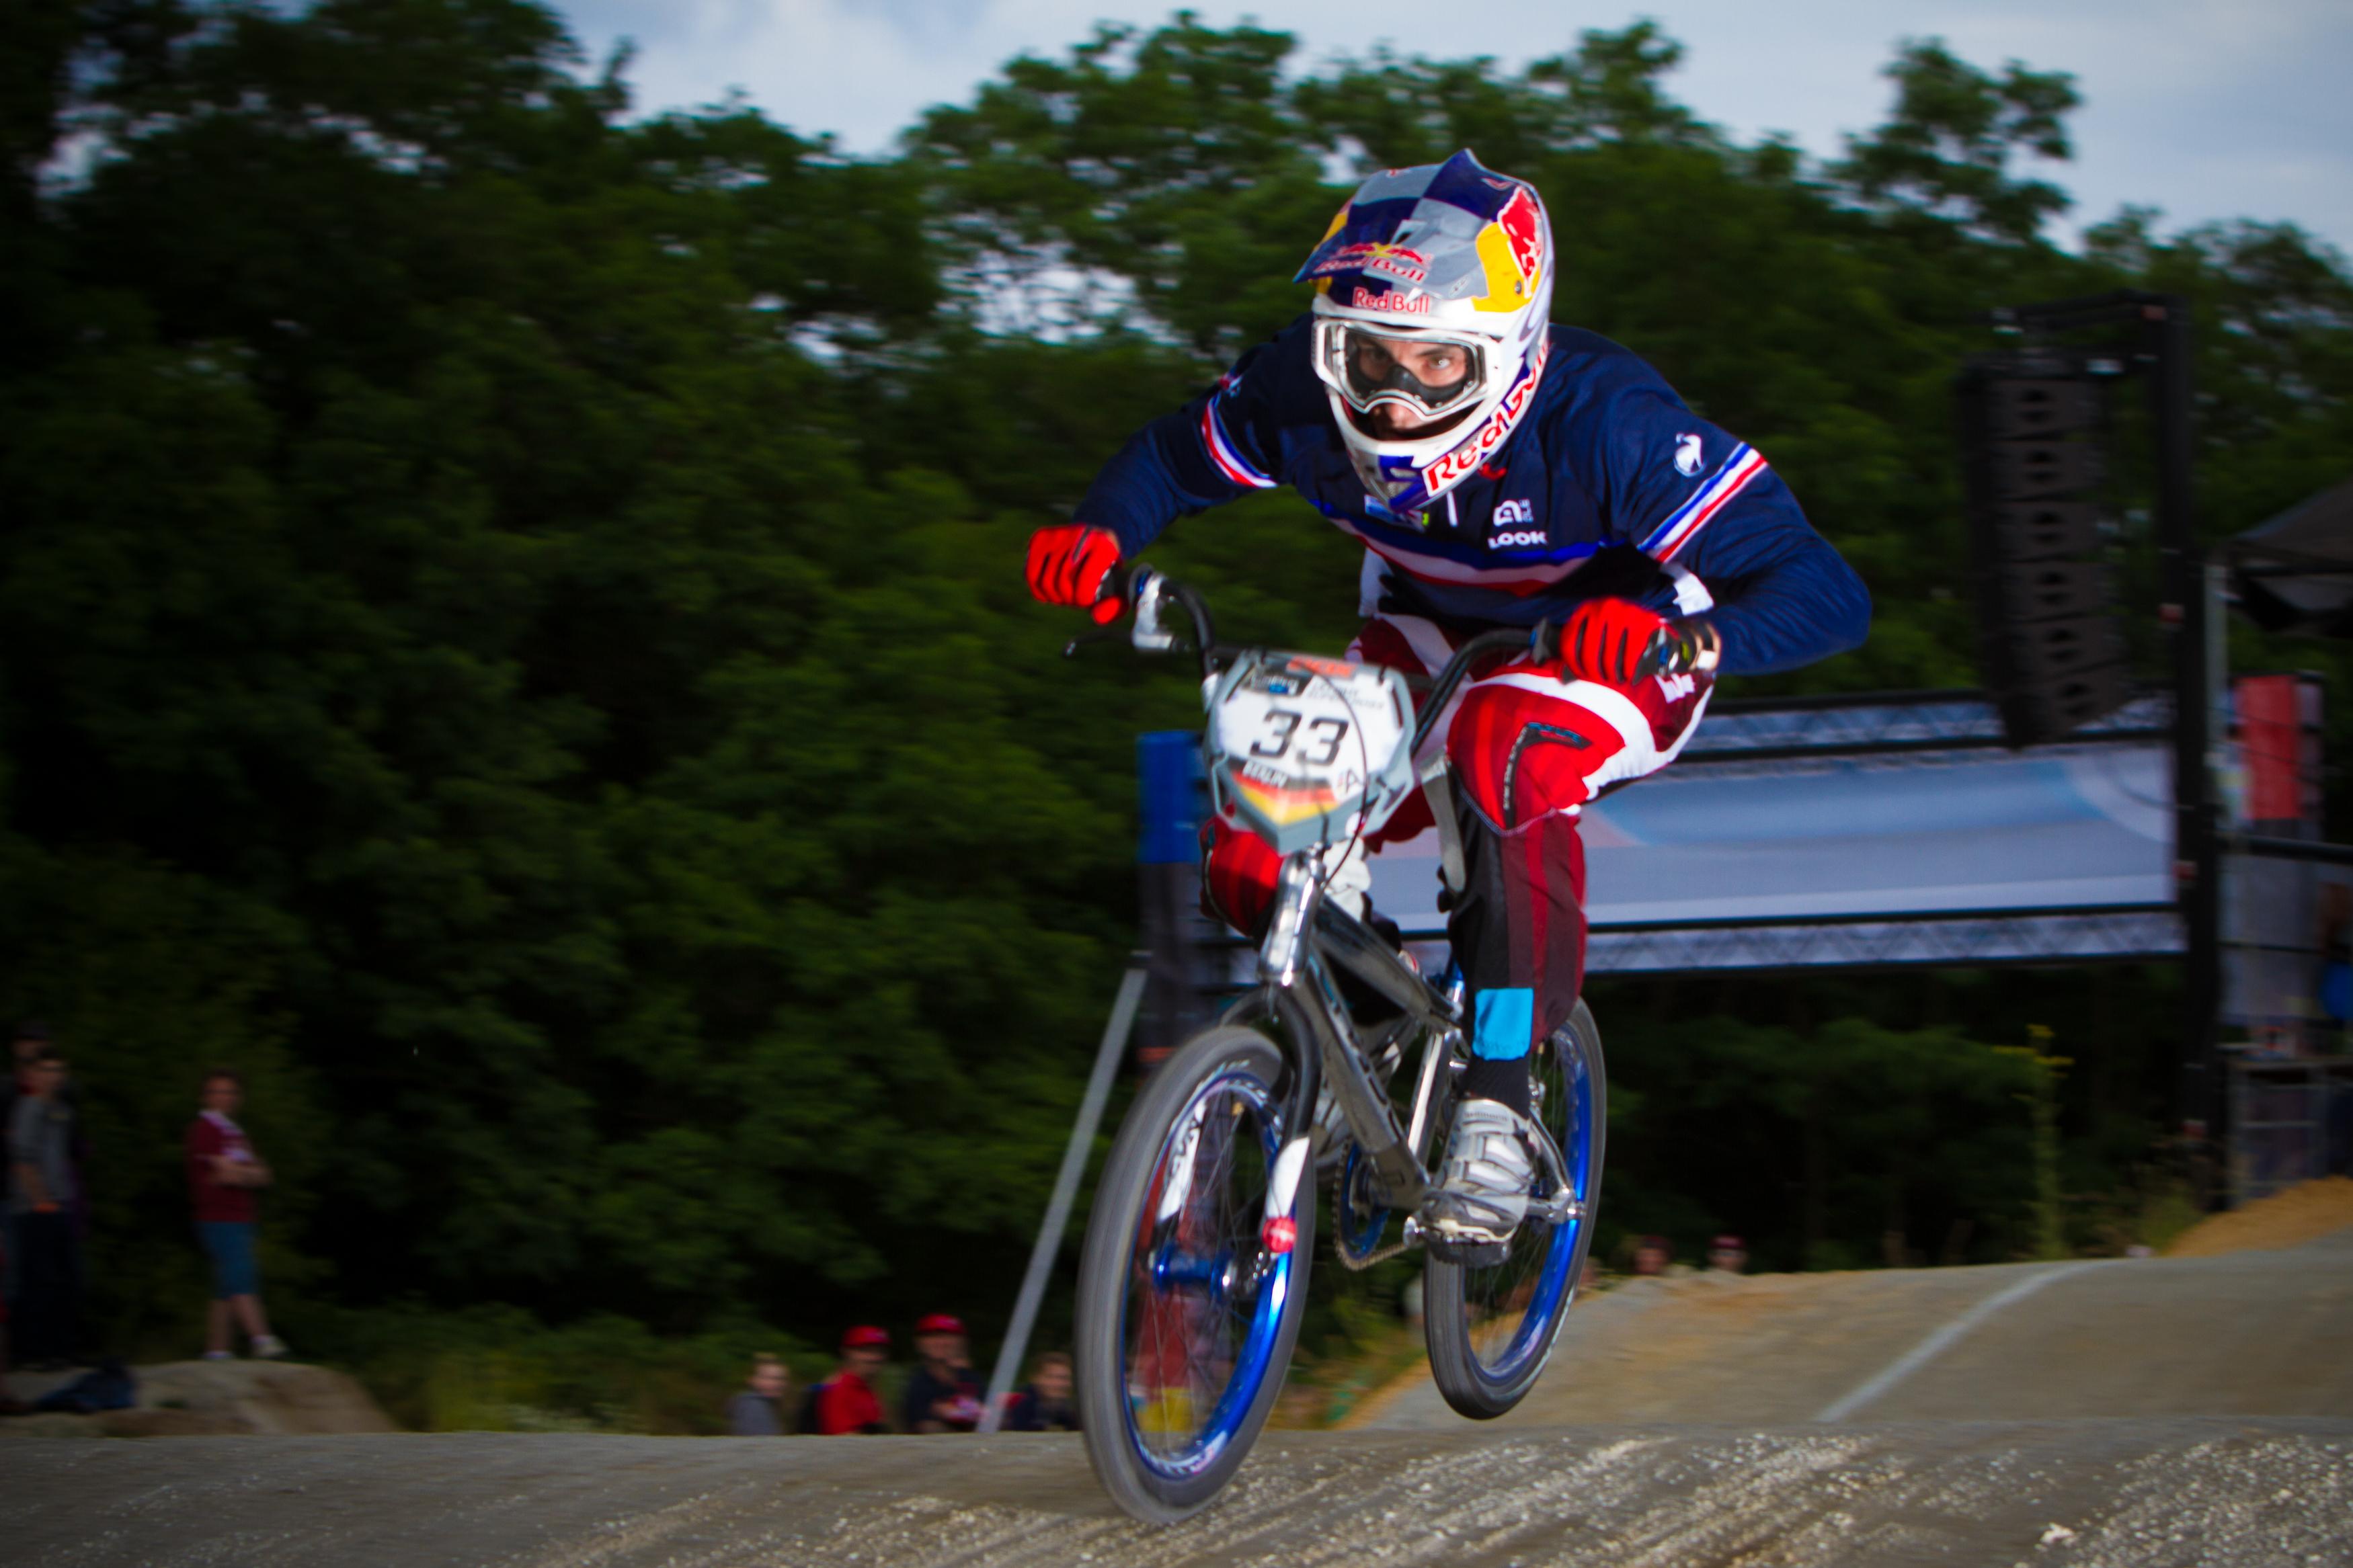 UCI BMX SX #3 – Chase BMX Report – Joris on the podium